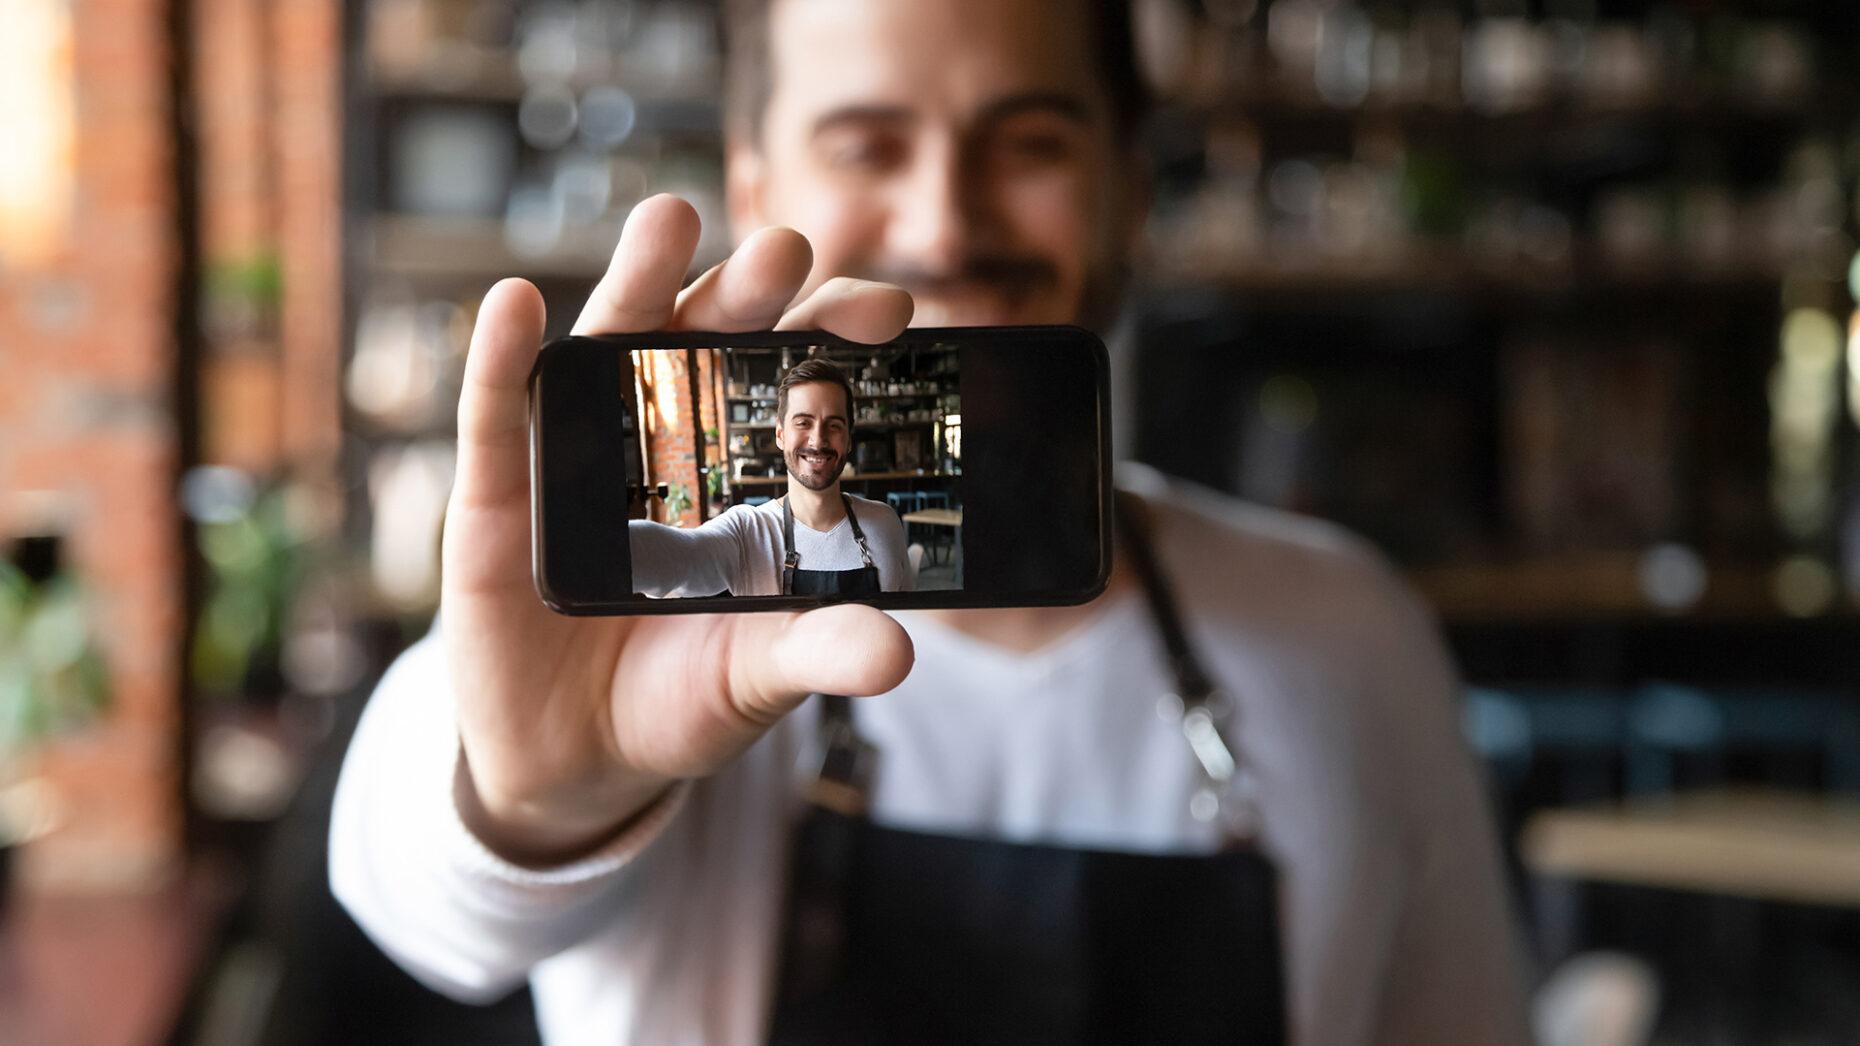 Smiling restaurant owner holding smartphone with camera on make selfie